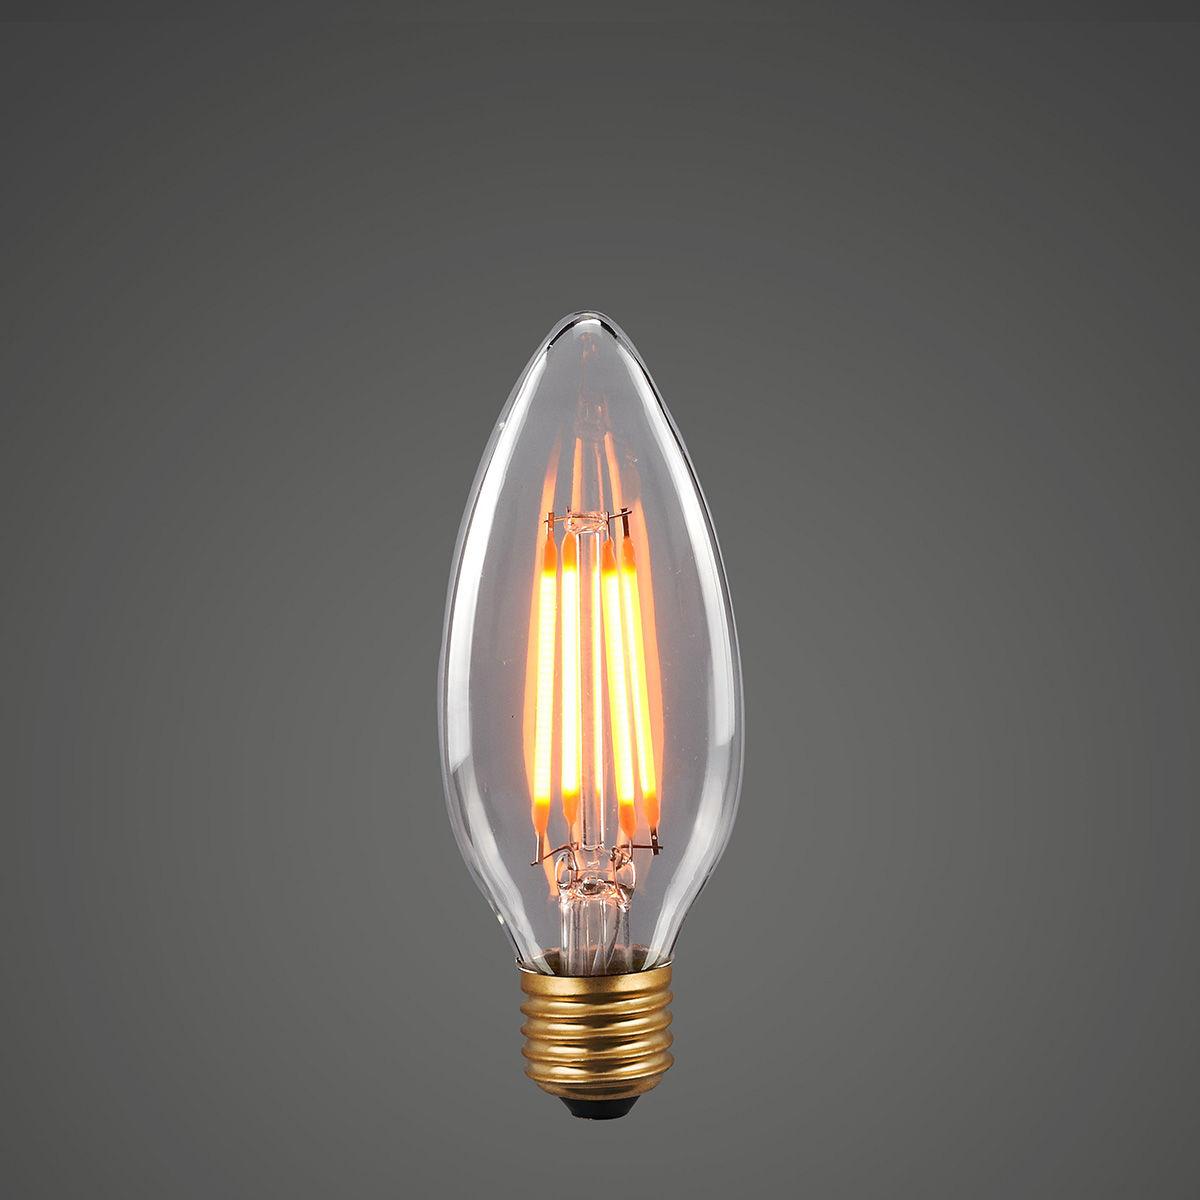 RETRO LED BULB 380635 ITALUX